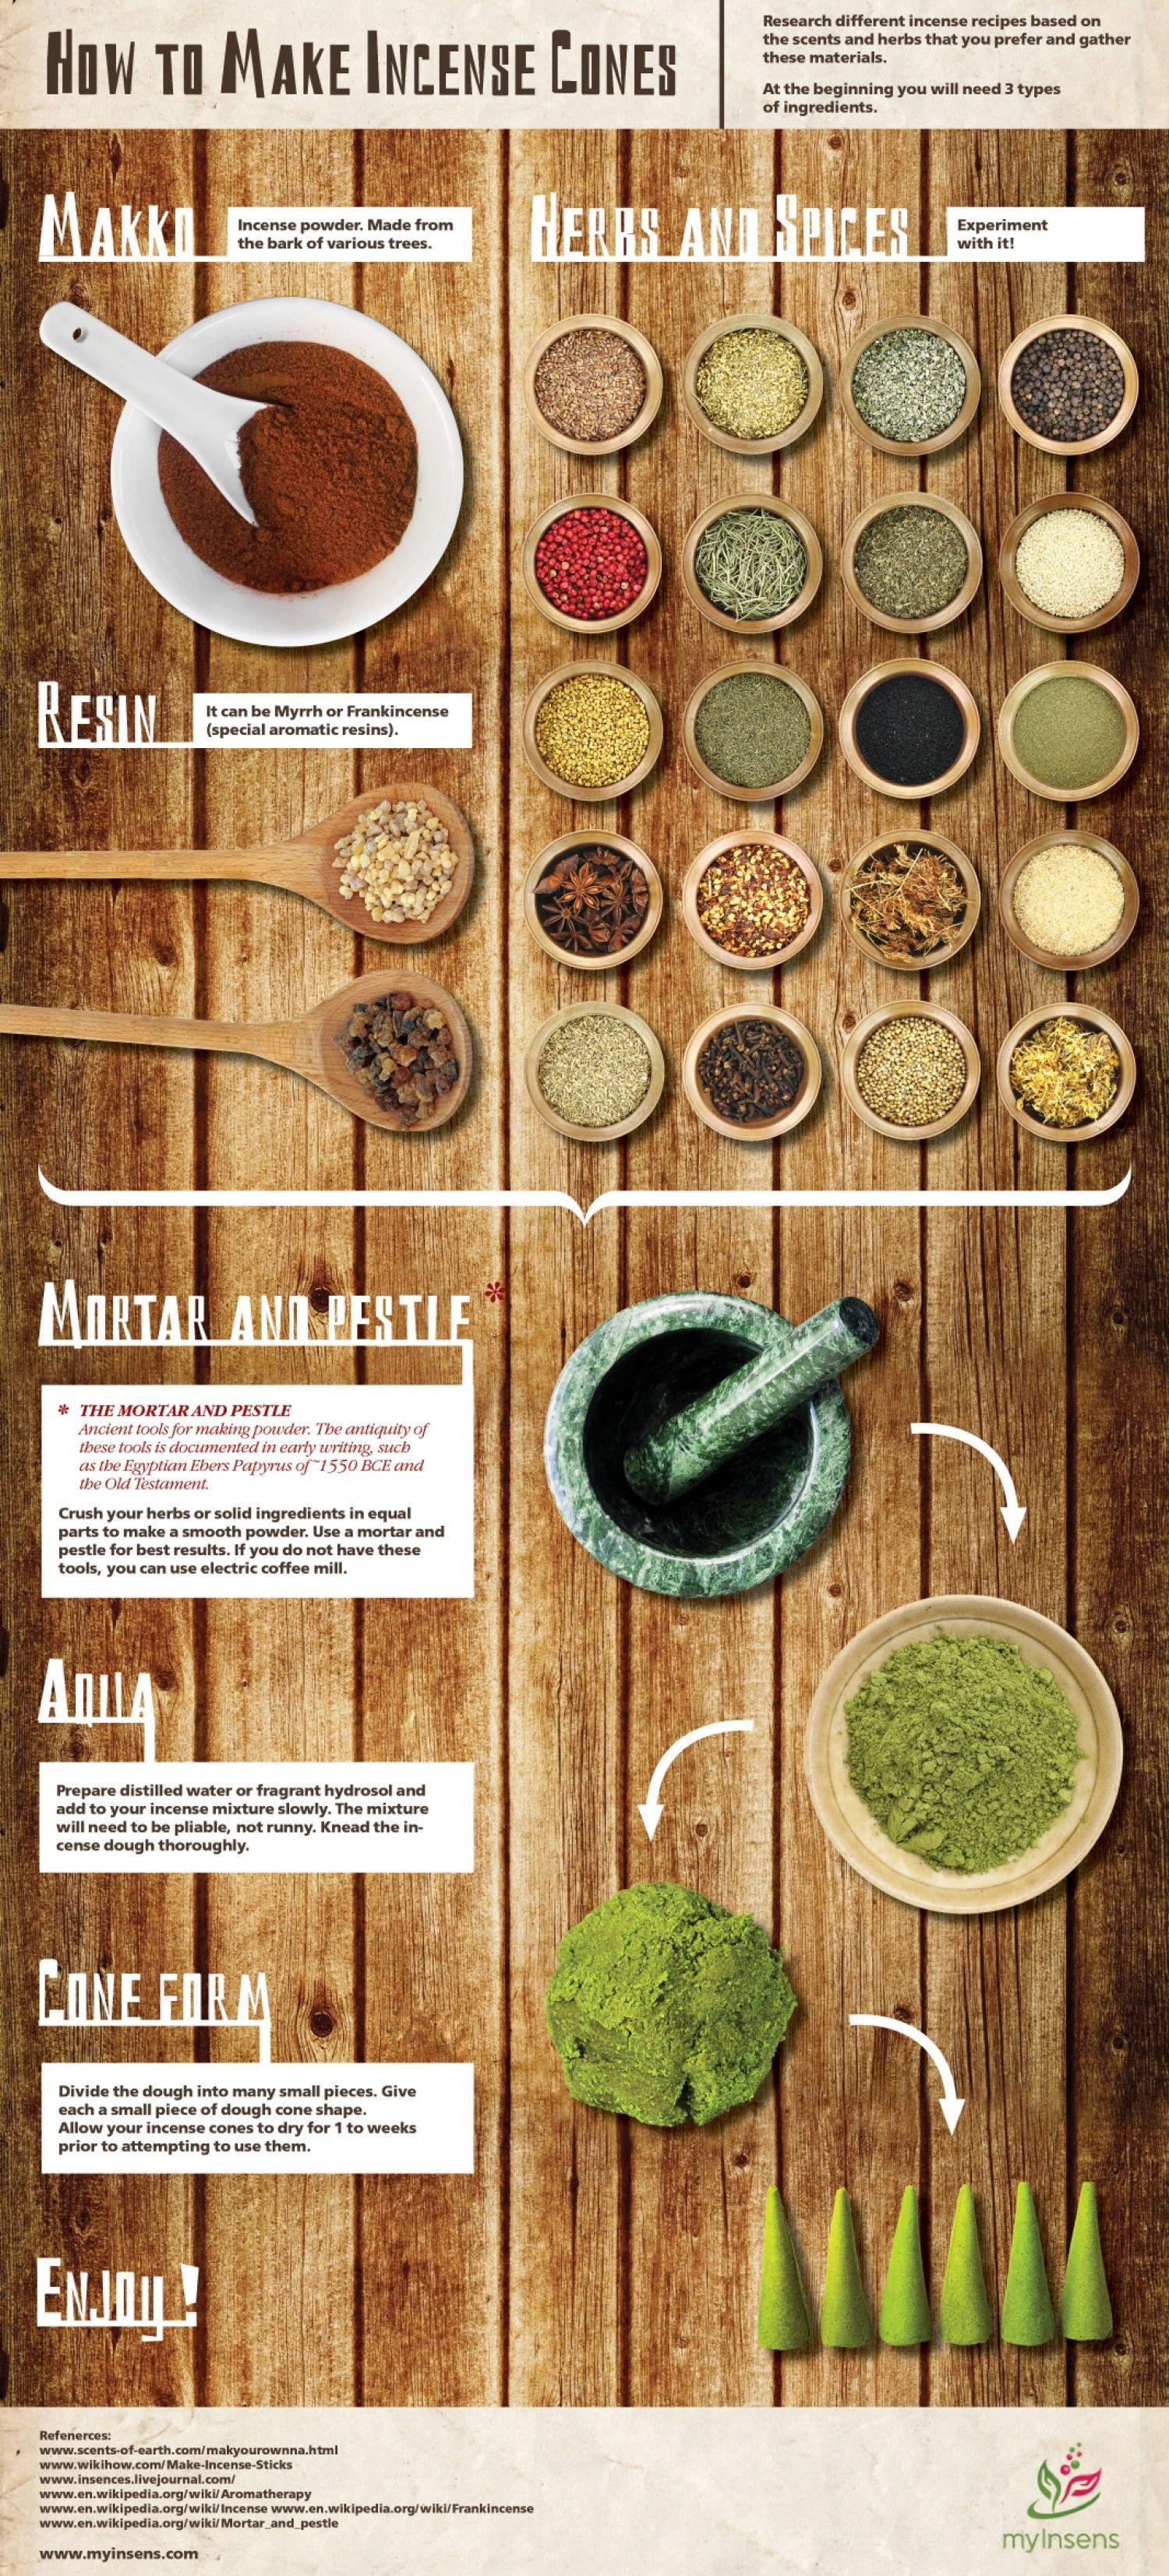 How to make Incense Cones Infographic DESIGNED BY anastasiya krast